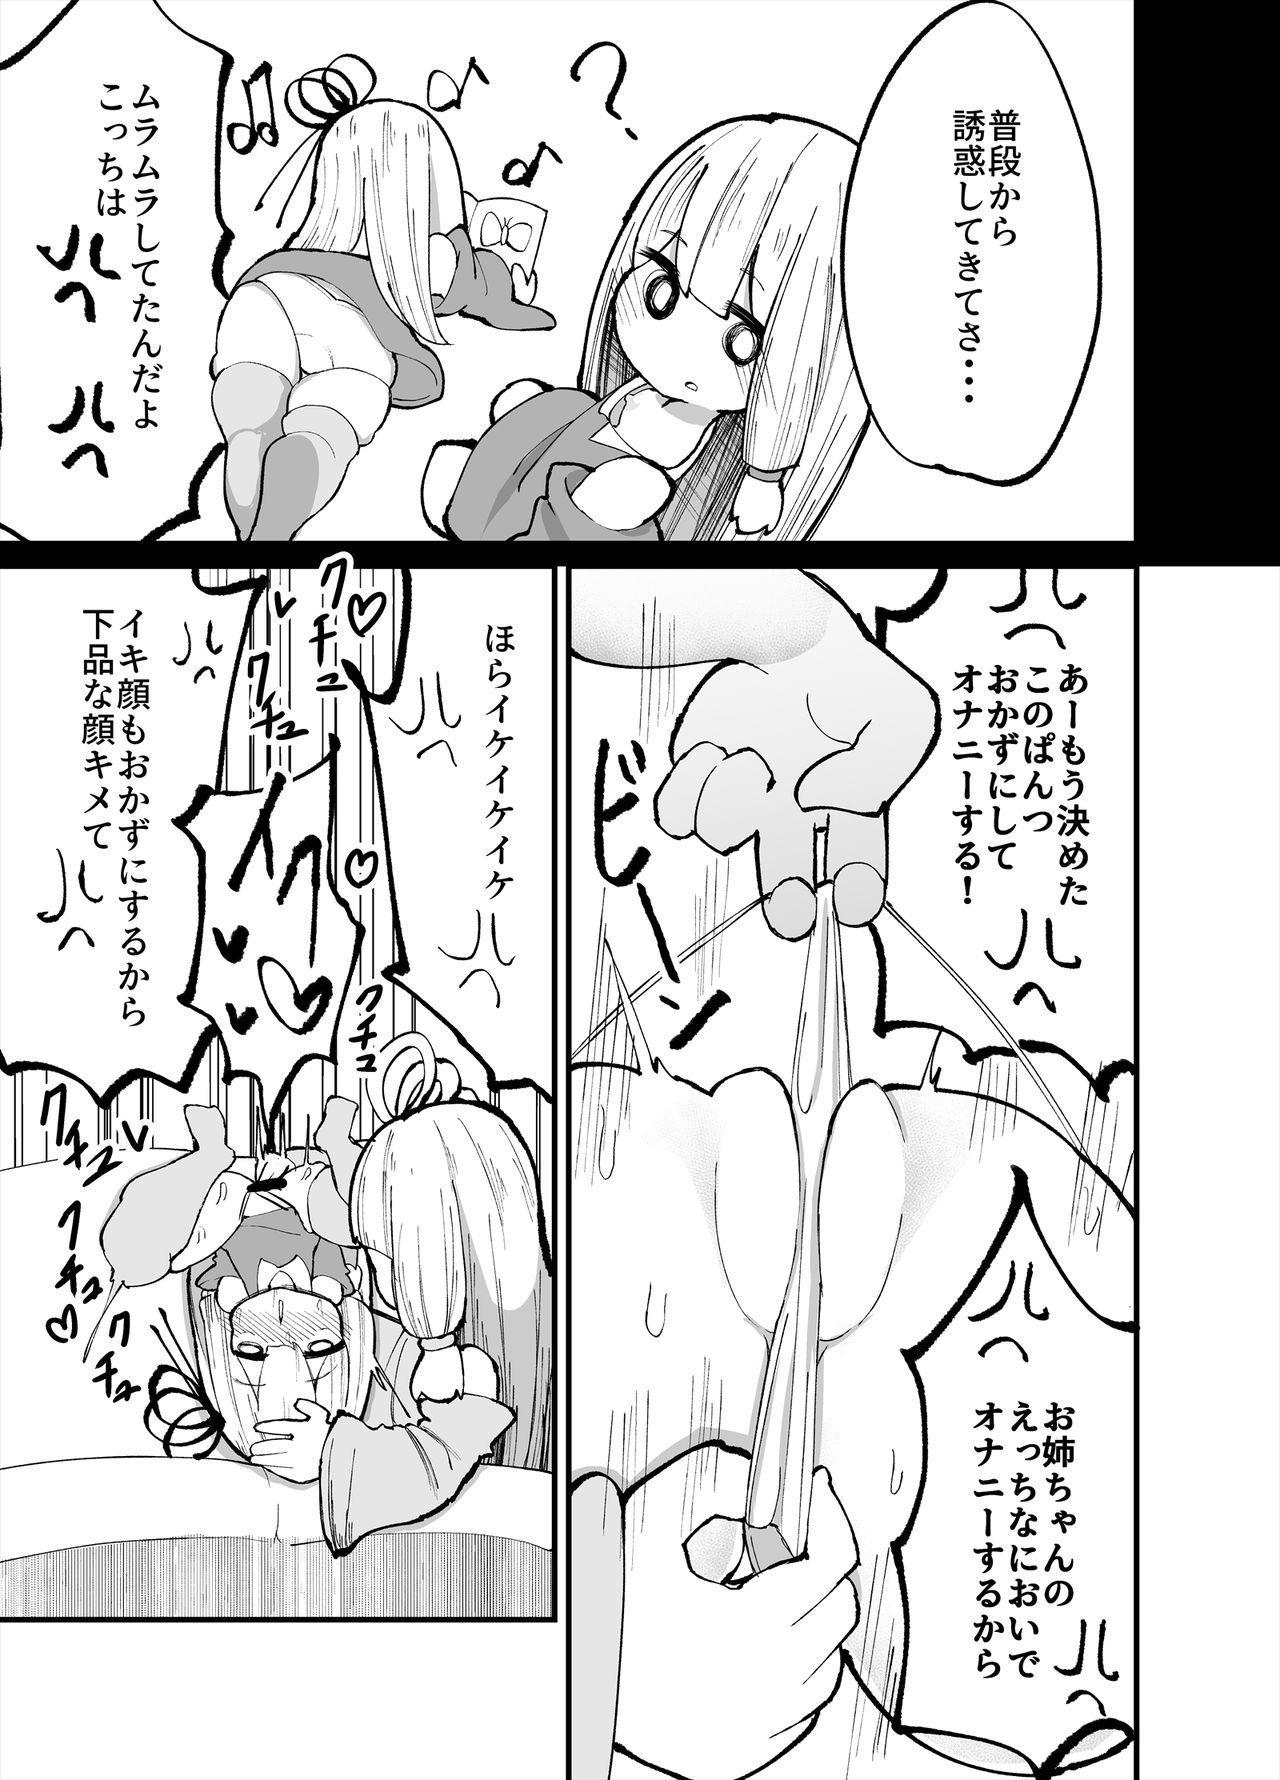 Chicchai! Onee-chan to Imouto no Ura 4